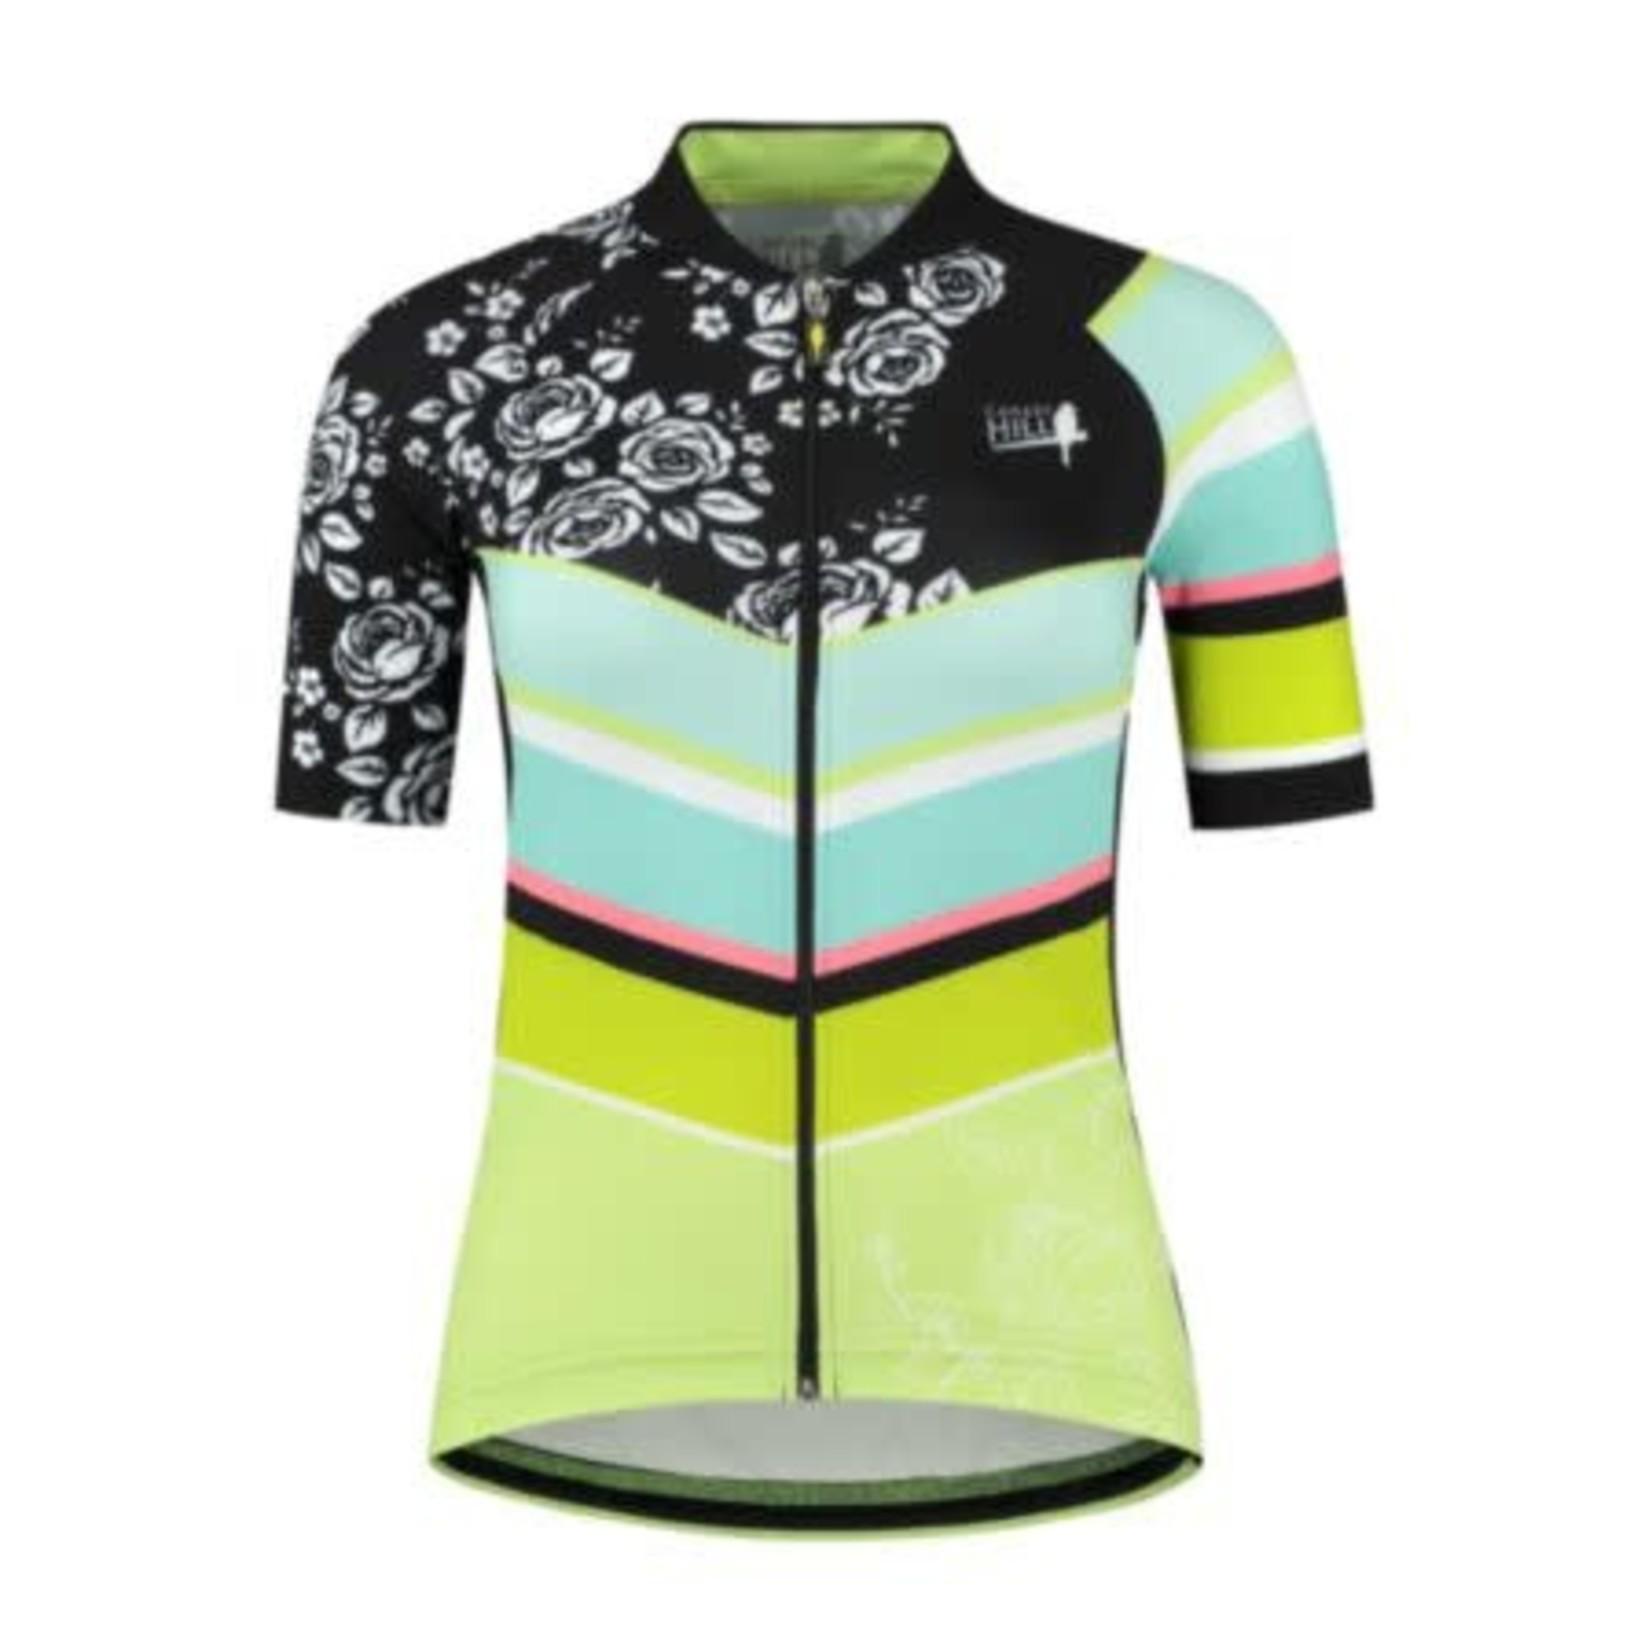 Canary Hill 'Breeze' Shirt